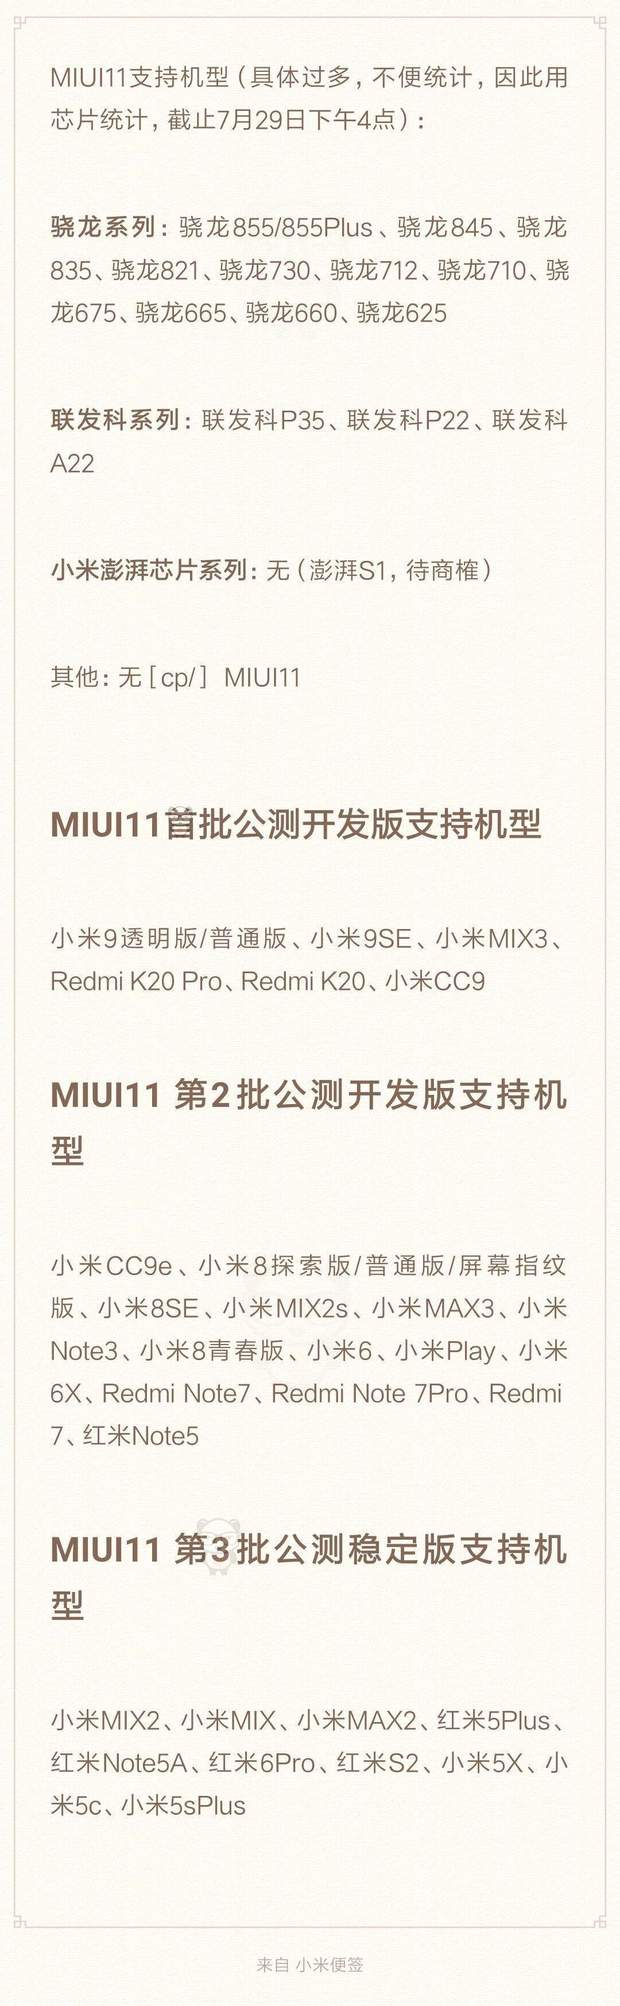 Прошивка Xiaomi MIUI 11